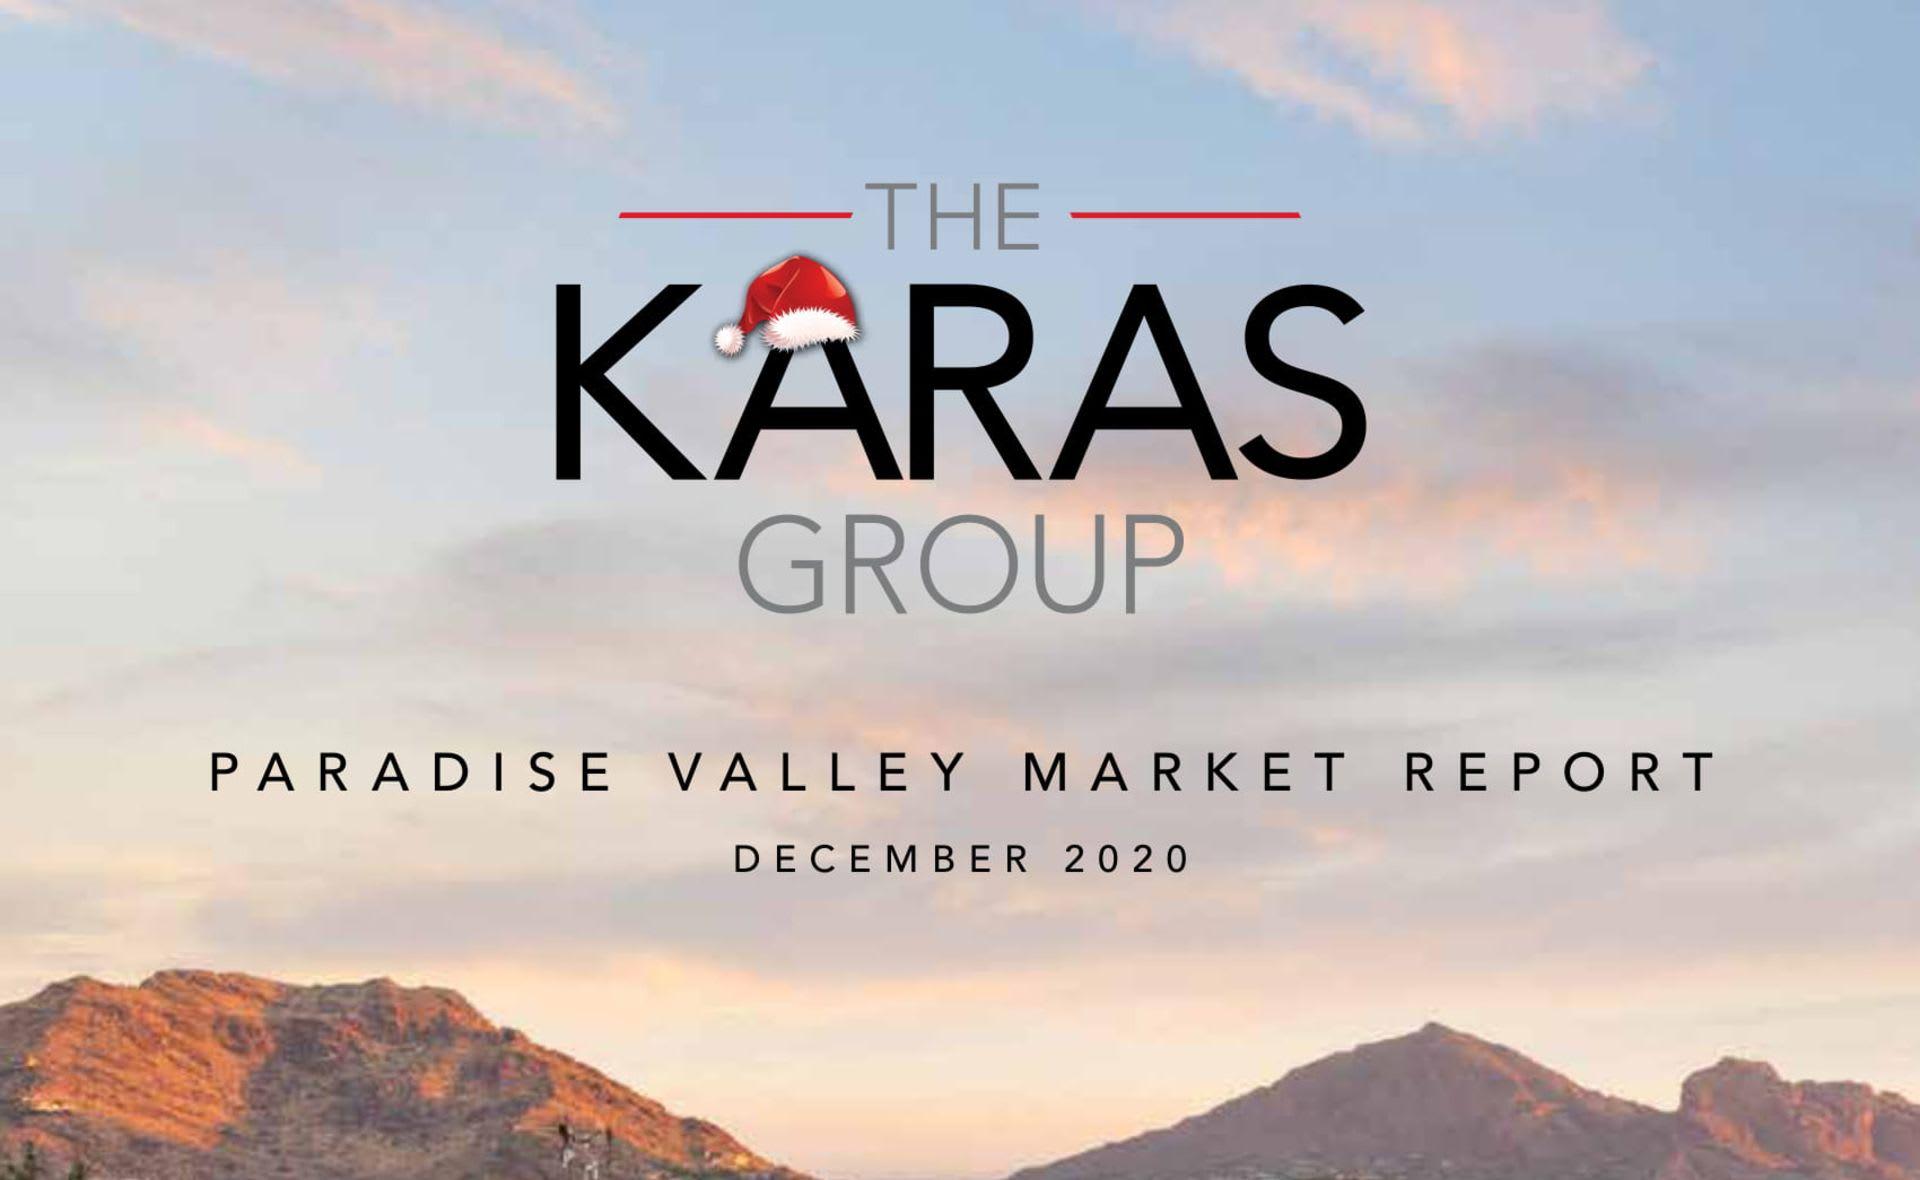 The Karas Group Paradise Valley Market Report (December 2020)